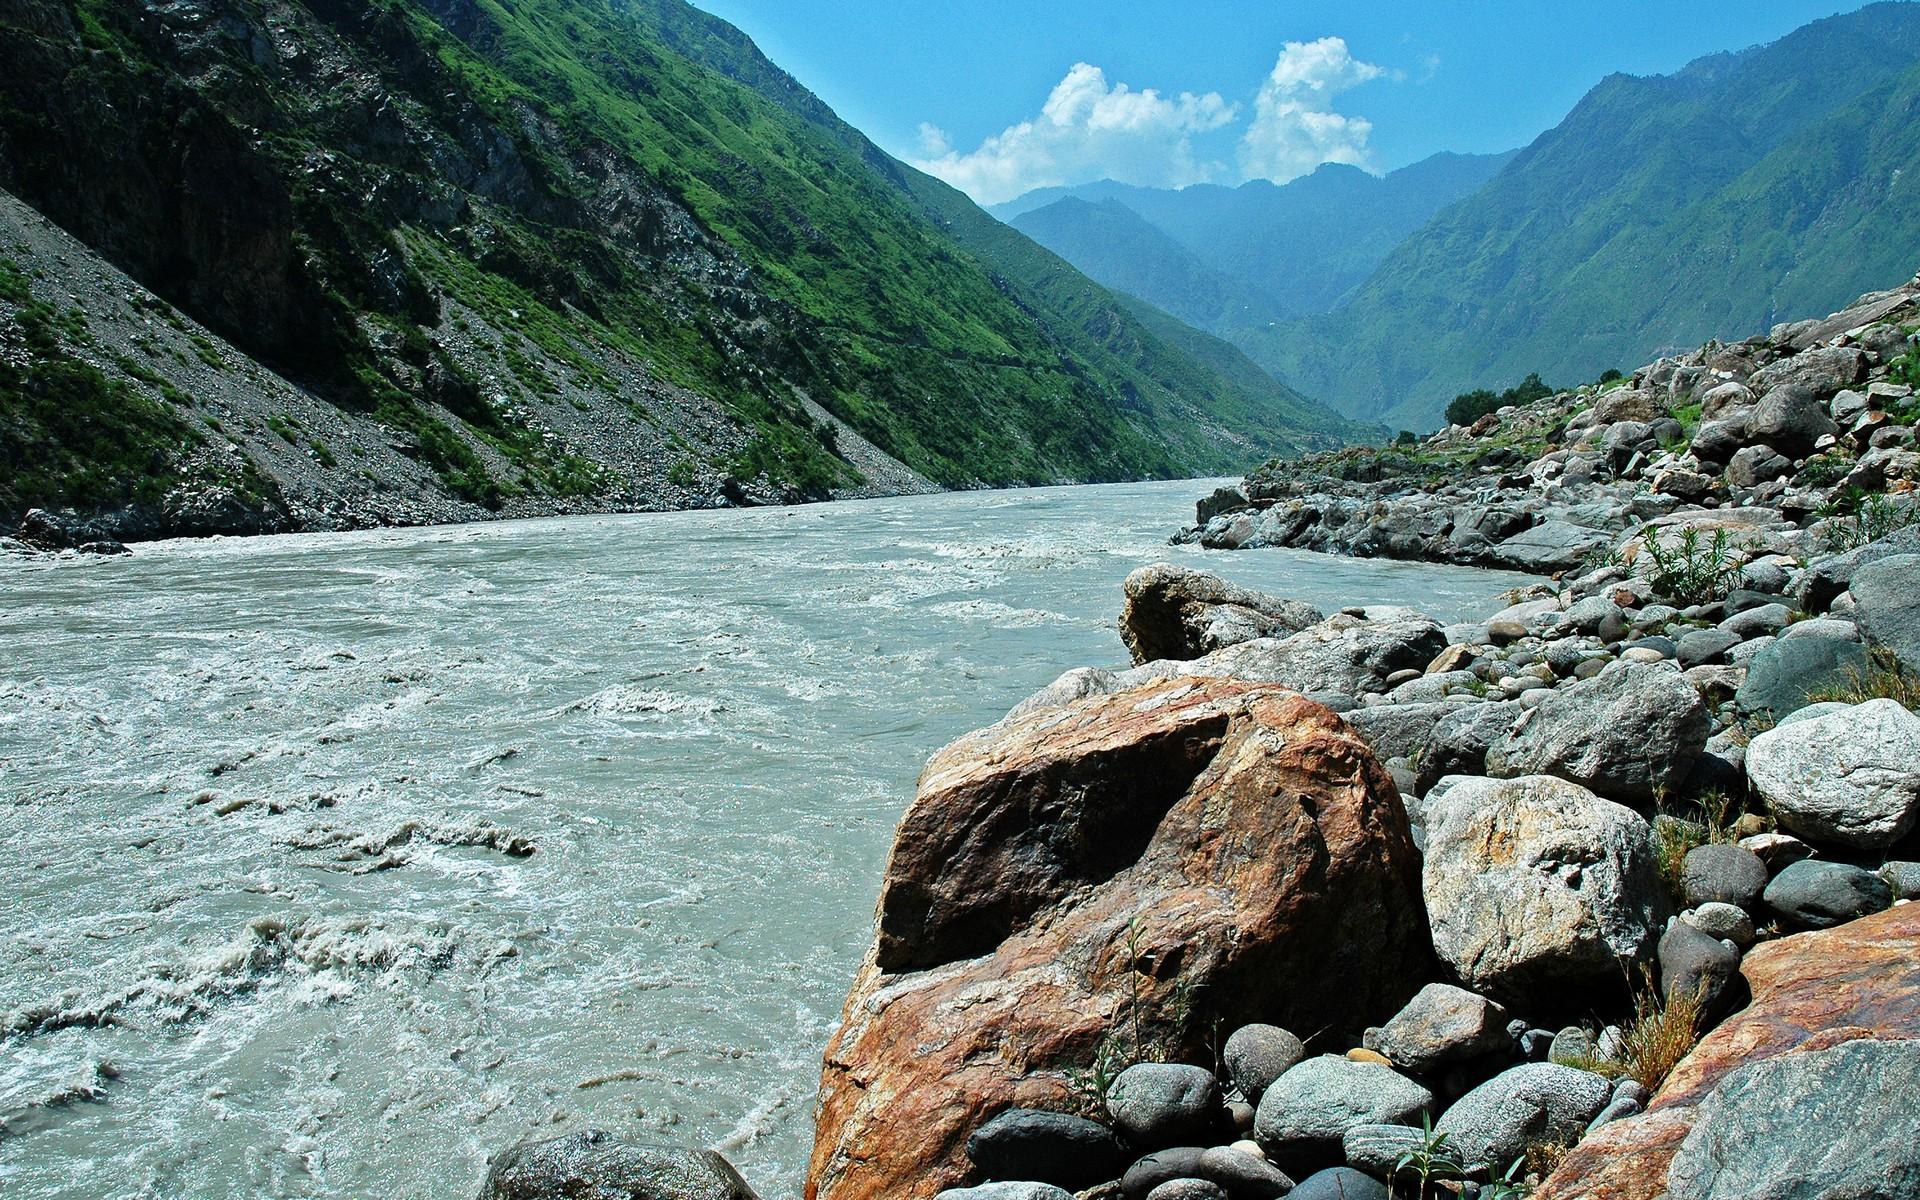 горы, камни, река